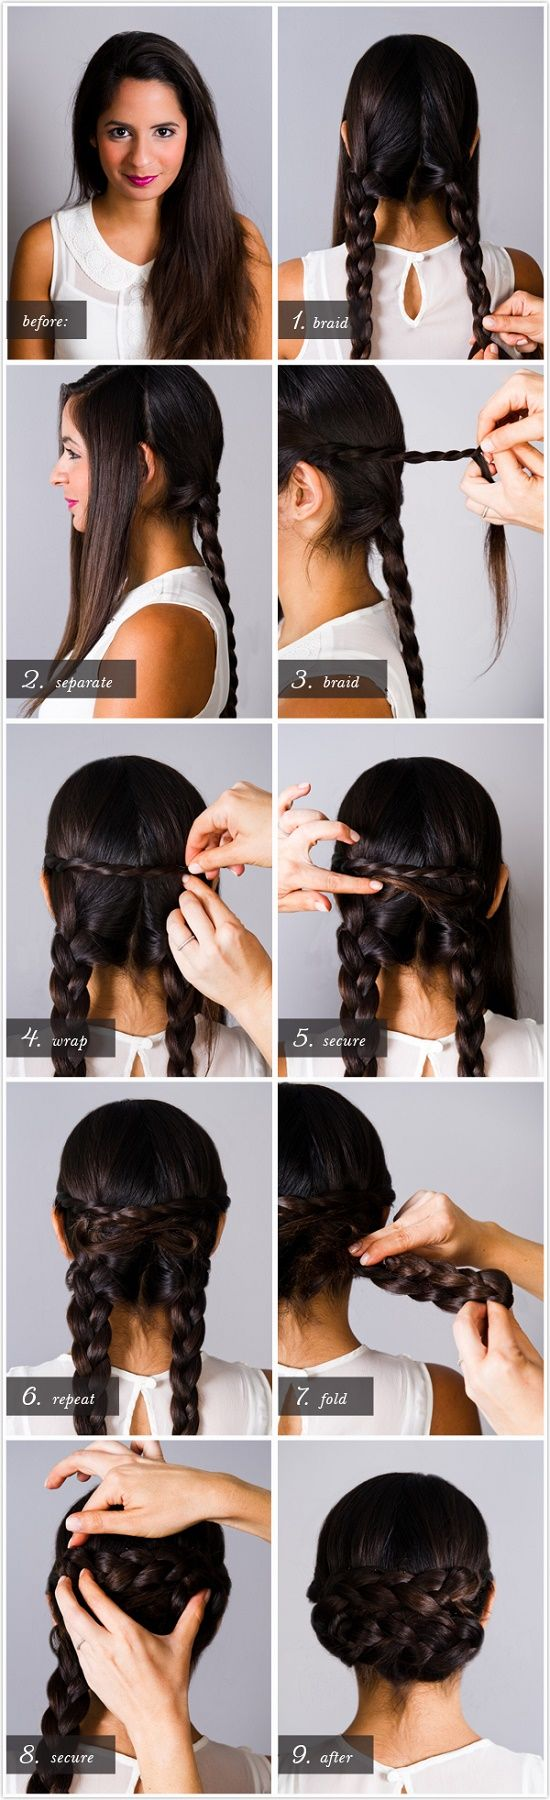 XV hairstyle14